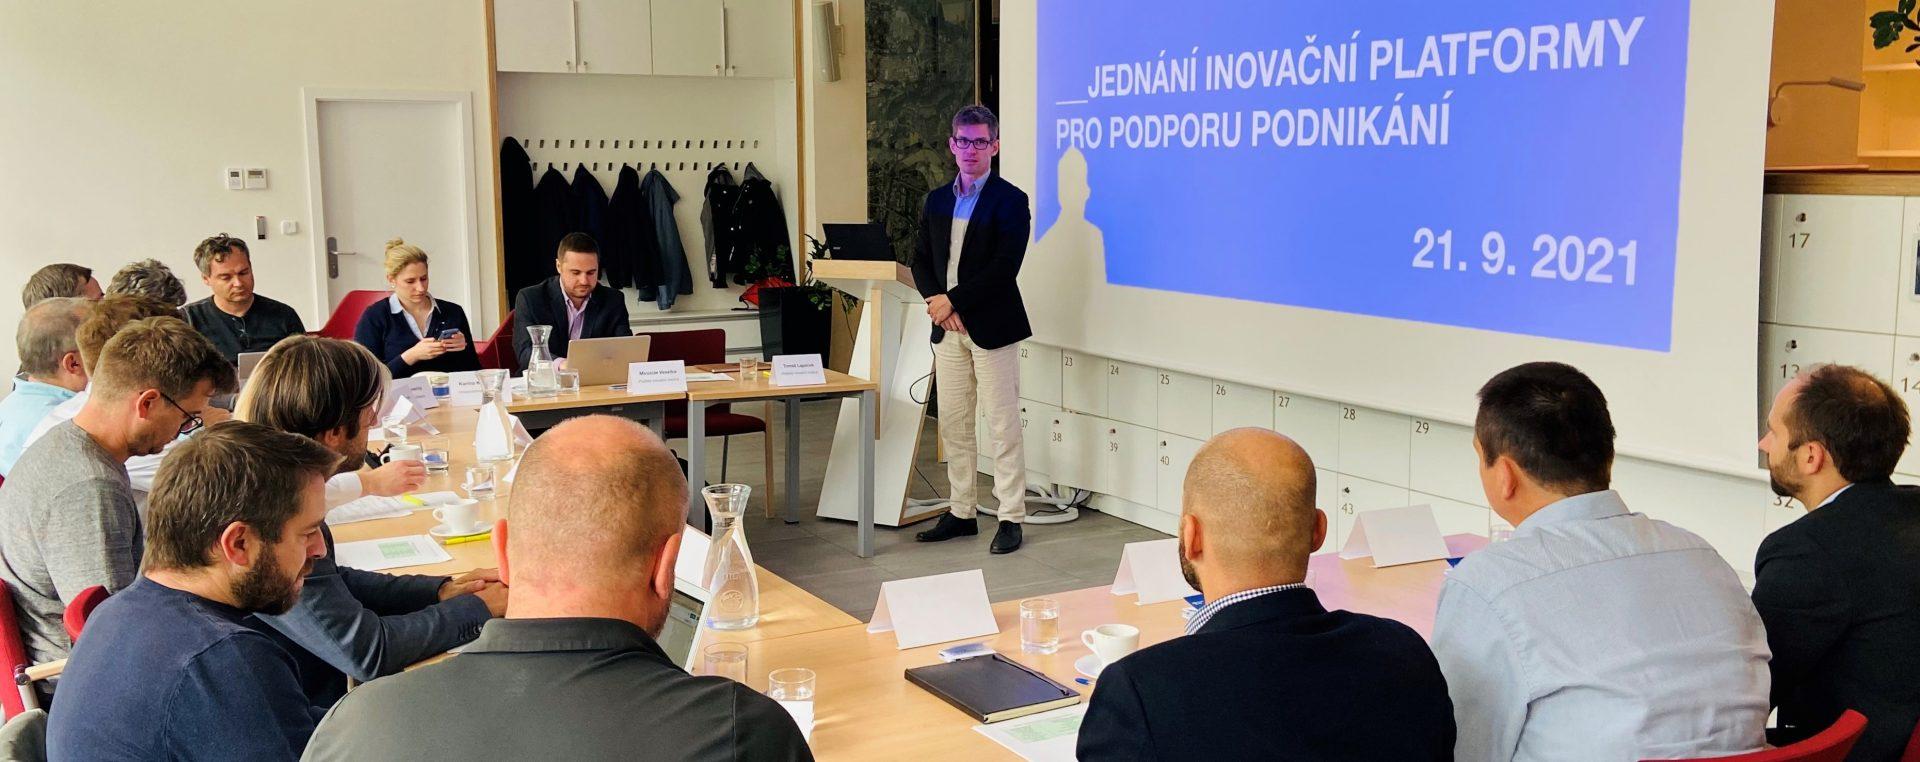 Platforma_rozvoj podnikani